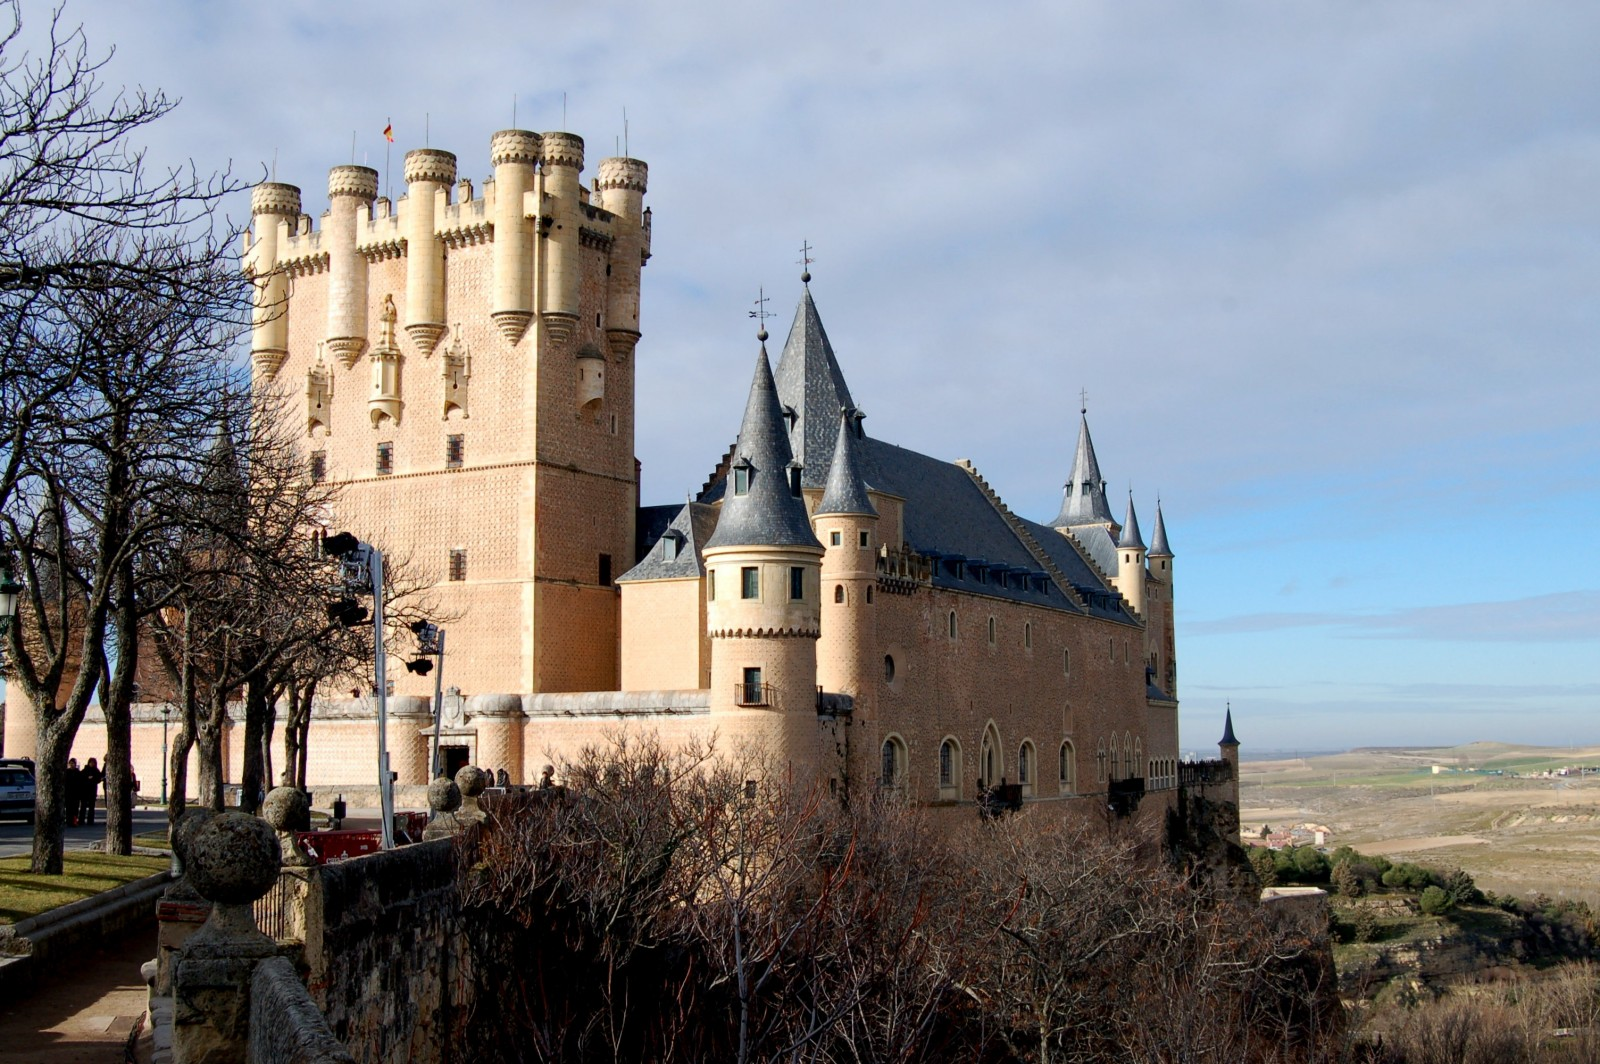 Alcazar_de_Segovia Spain